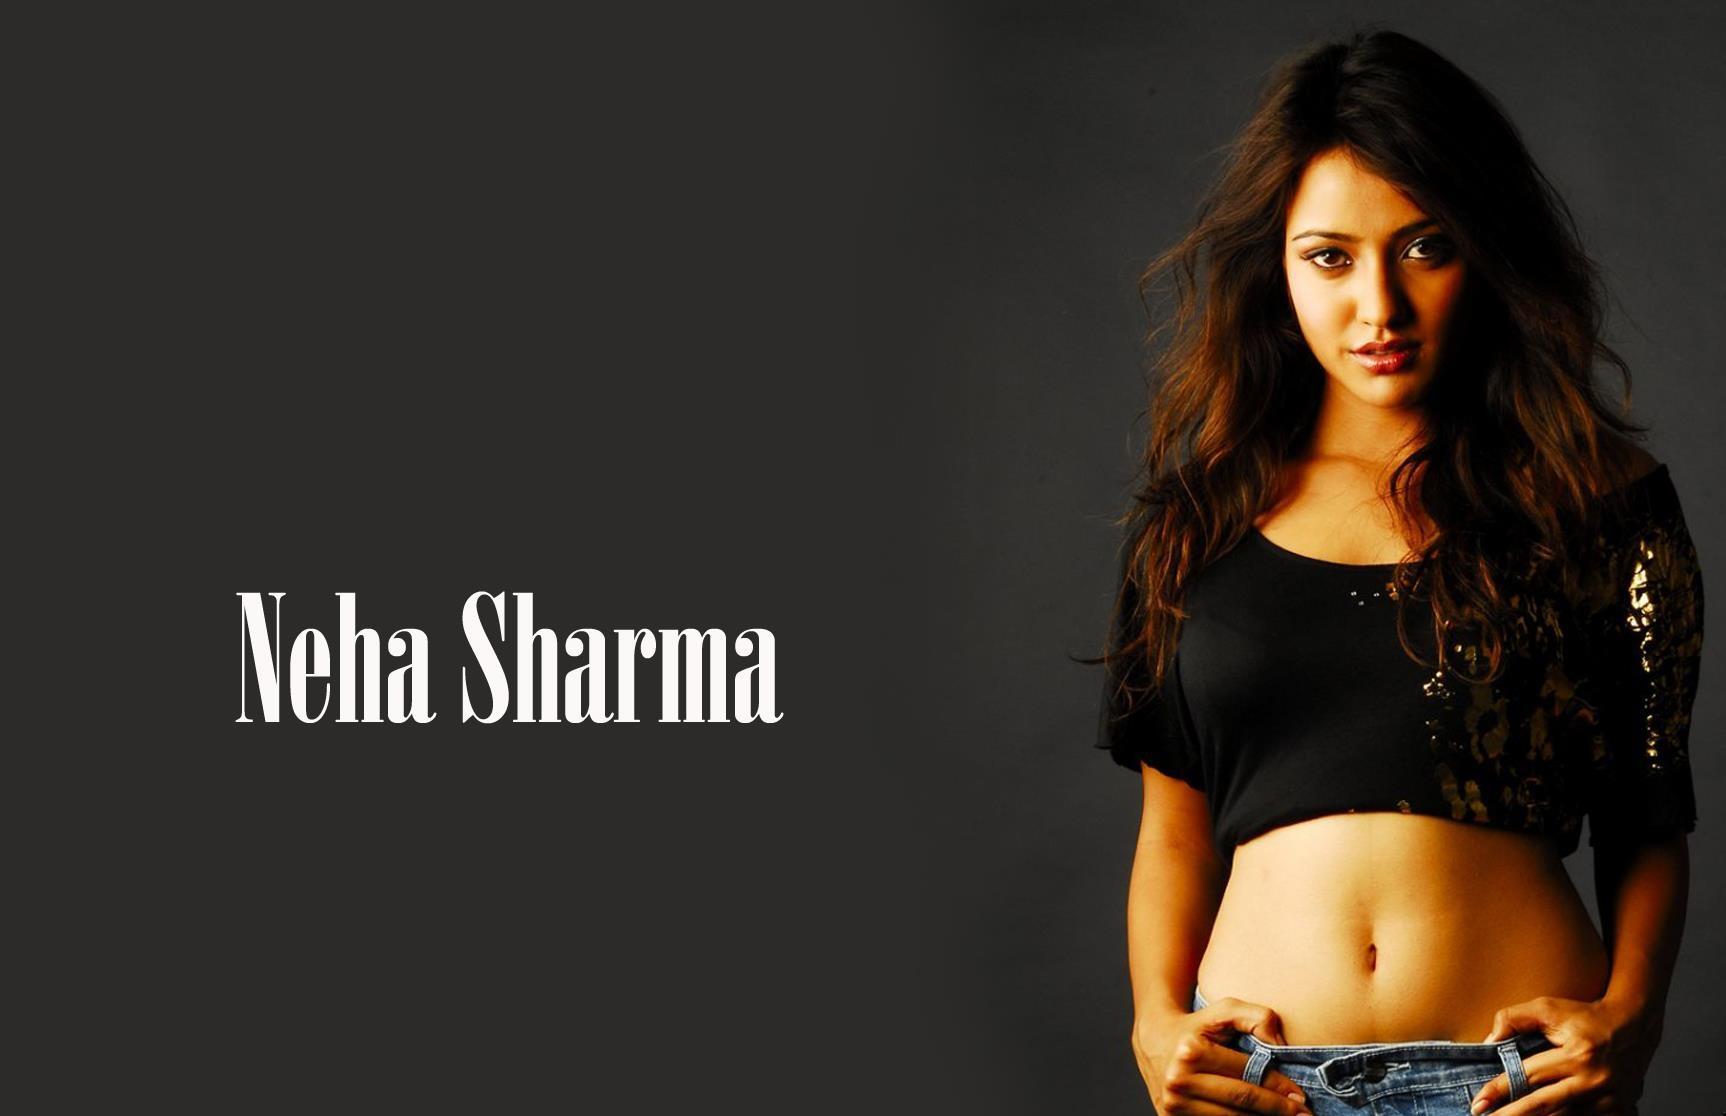 Hot-Neha-Sharma-Posing-in-Black